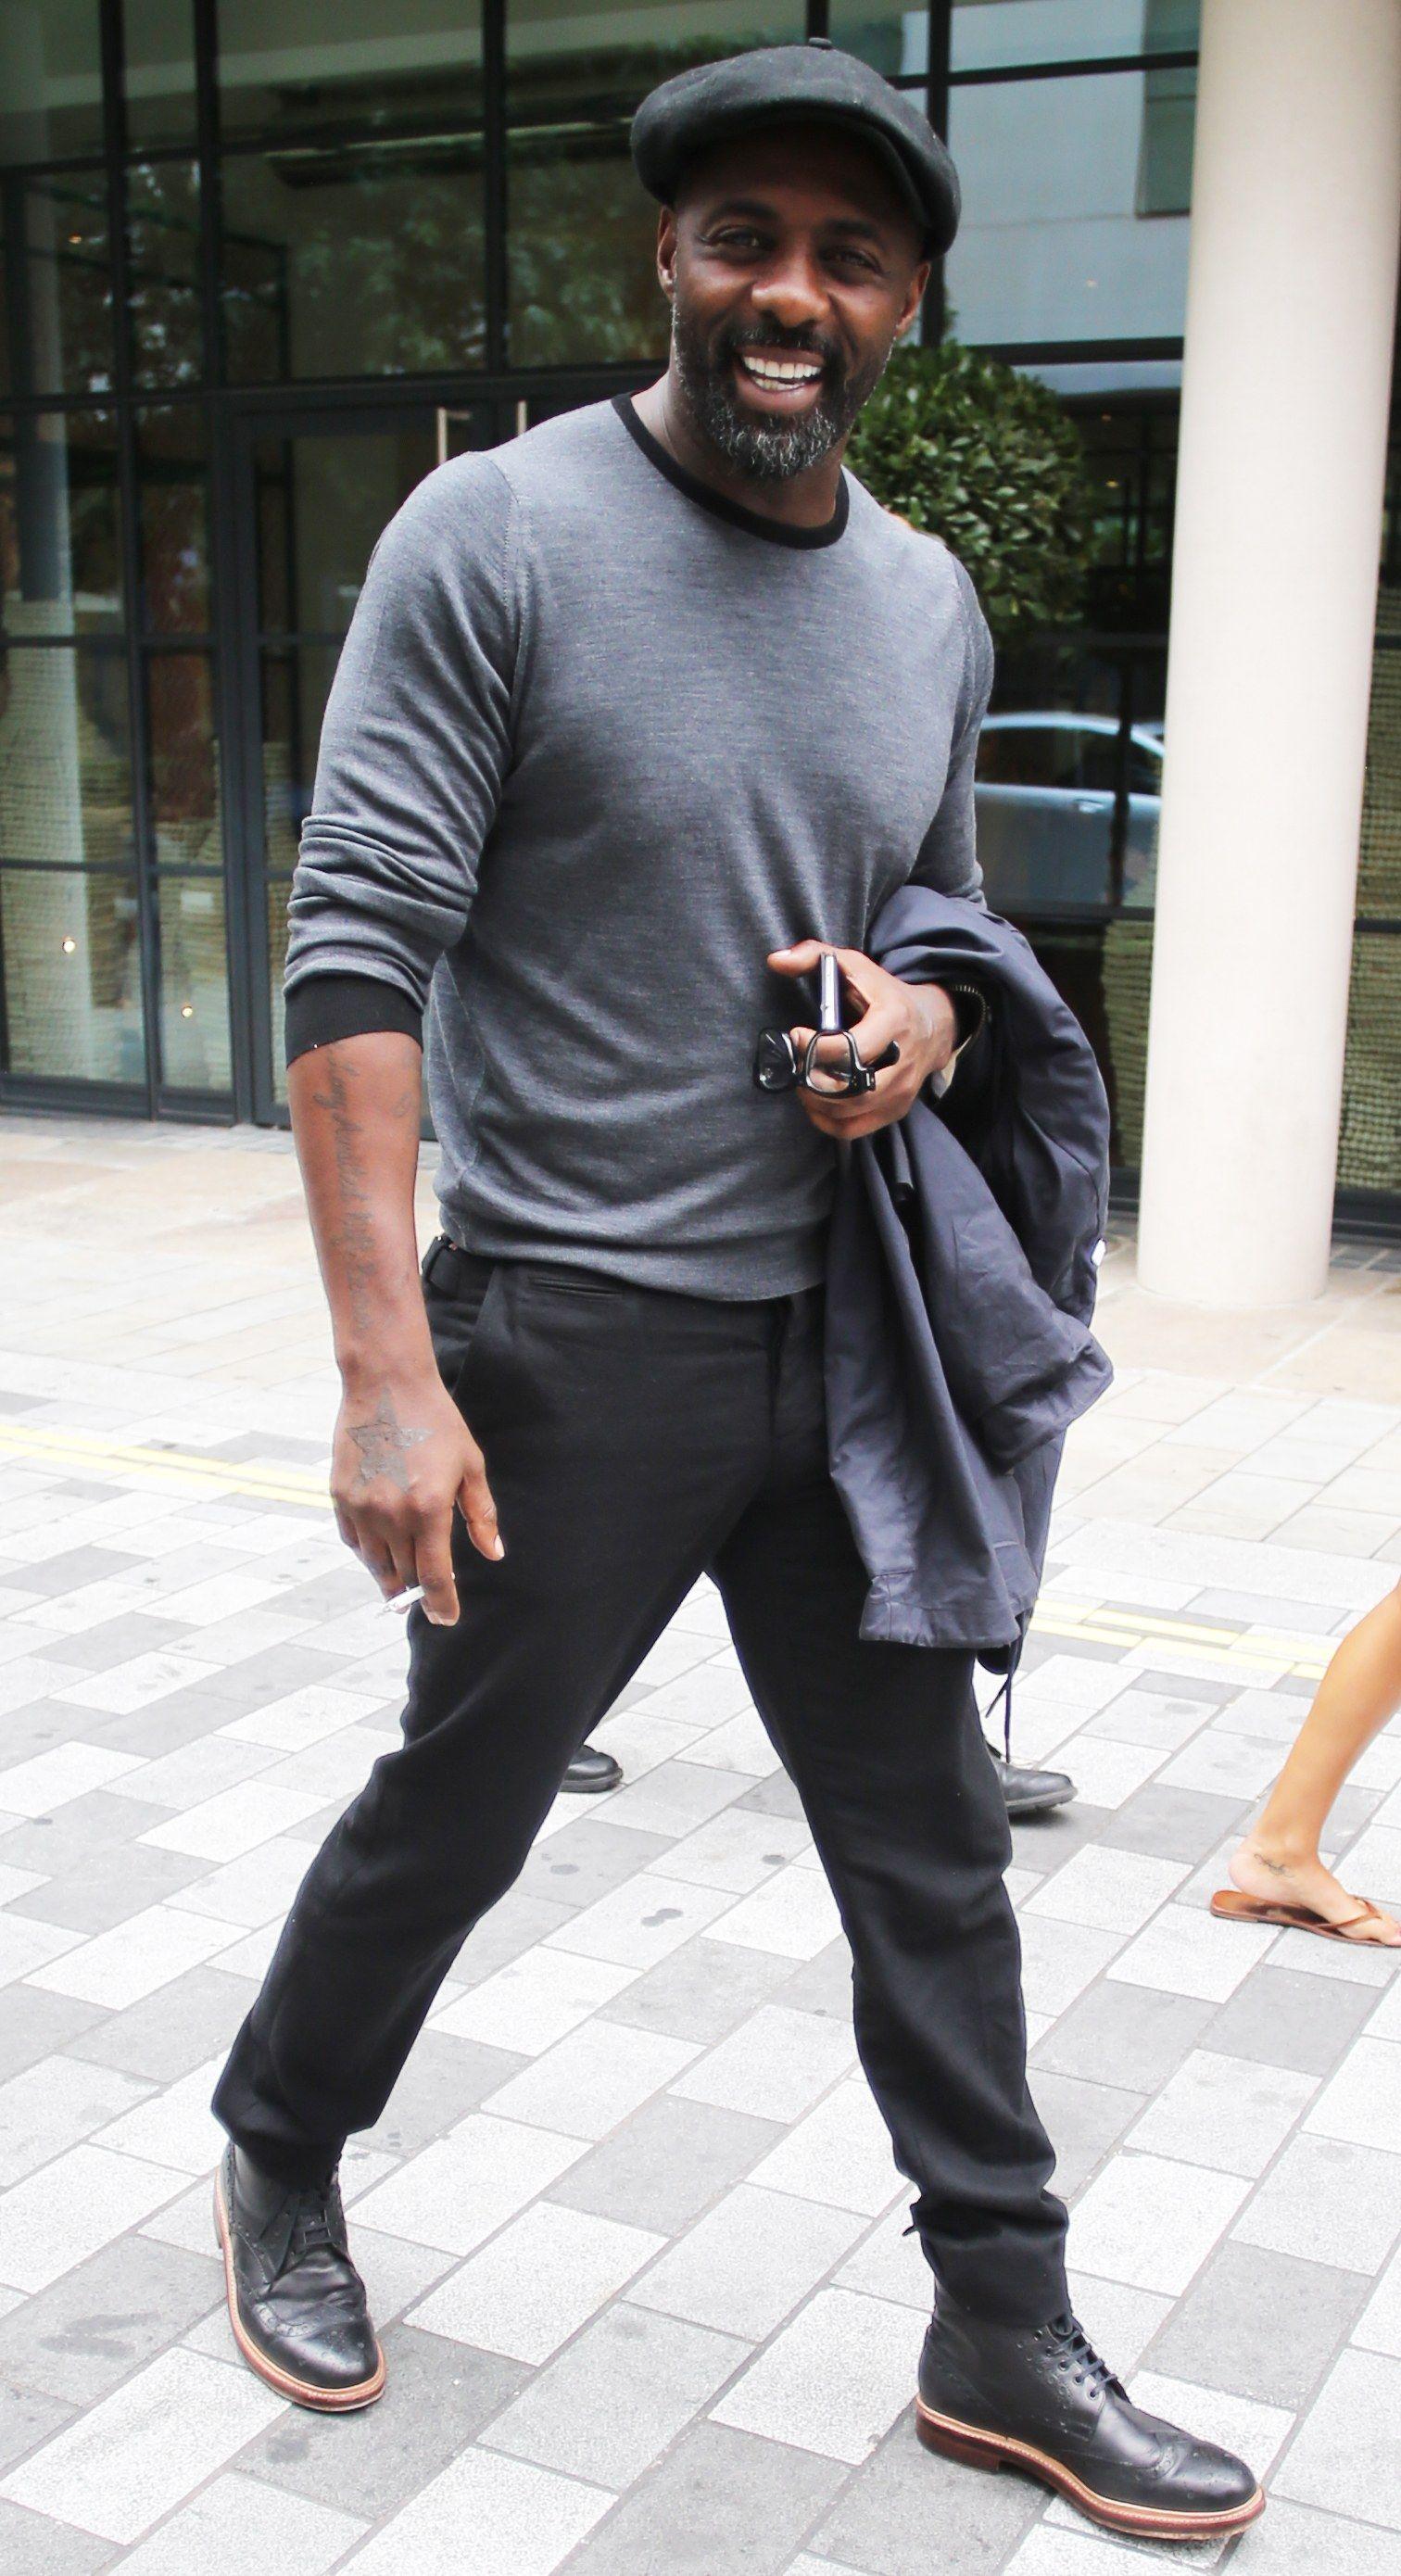 The Idris Elba Style Lookbook The Idris Elba Style Lookbook new photo